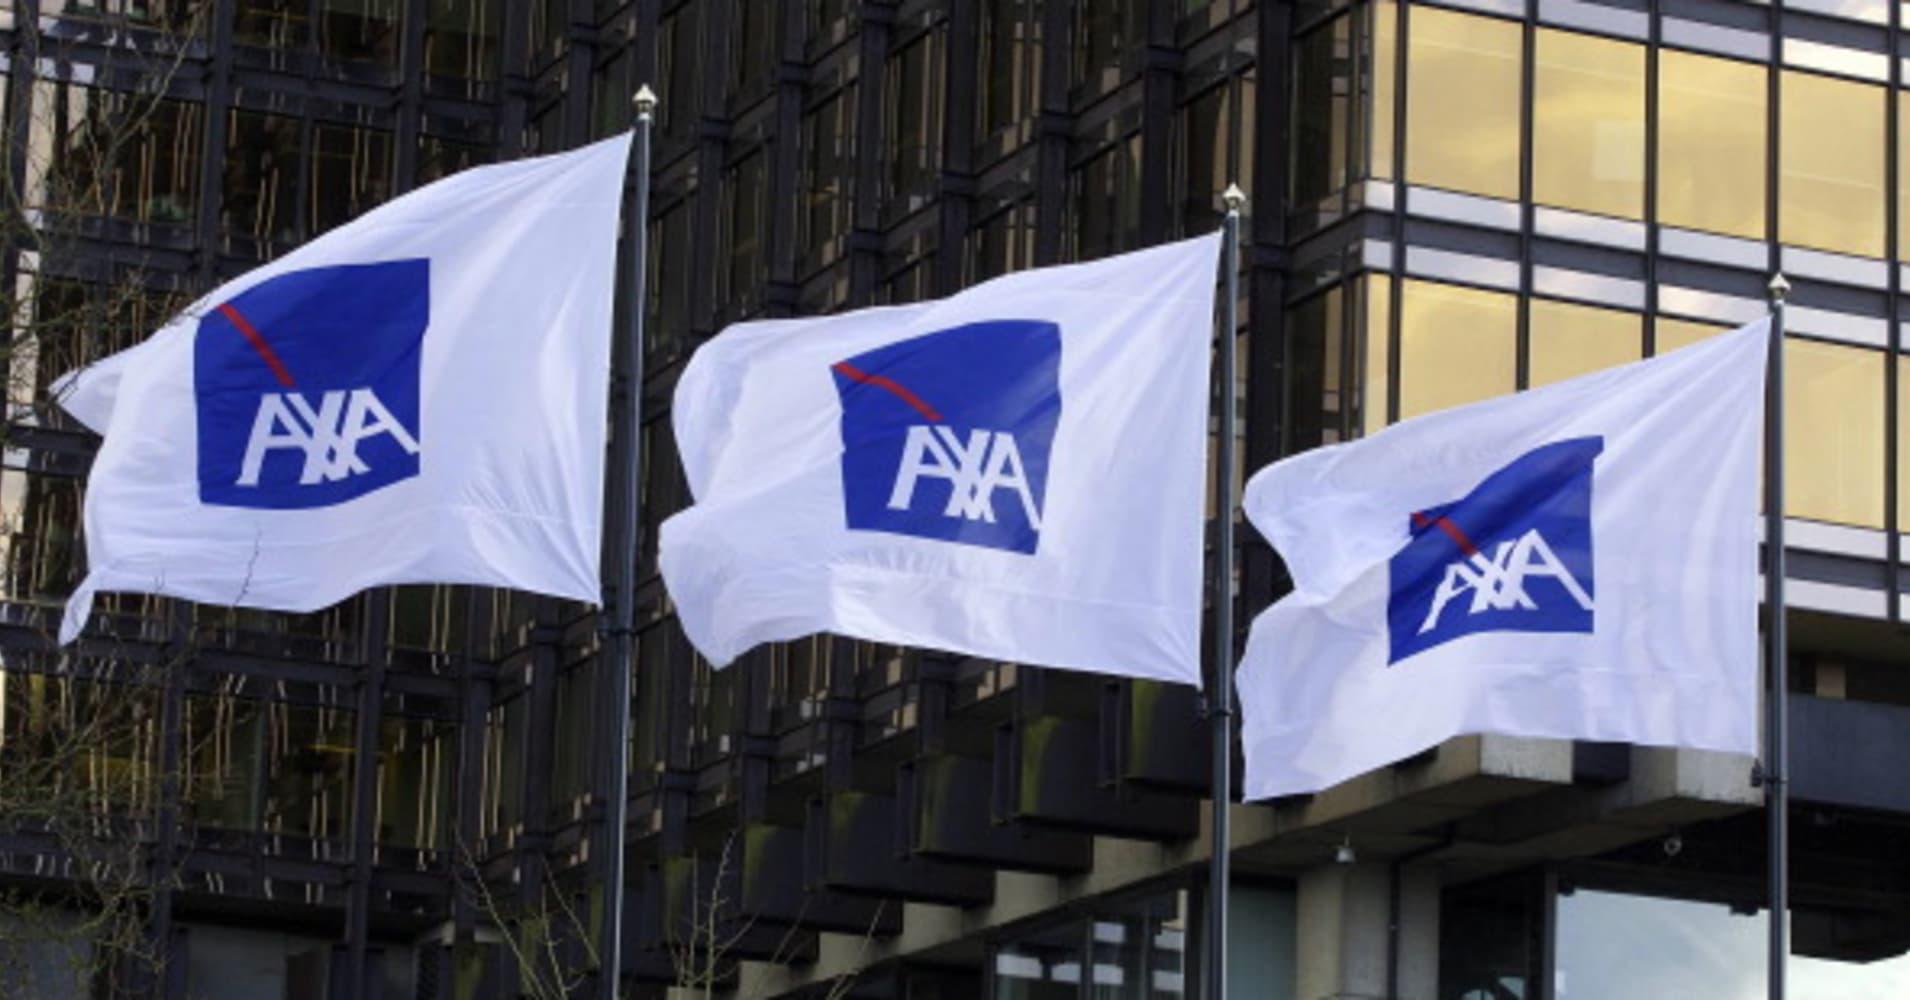 AXA buys Bermuda-based XL for $15 billion in latest insurance mega-deal